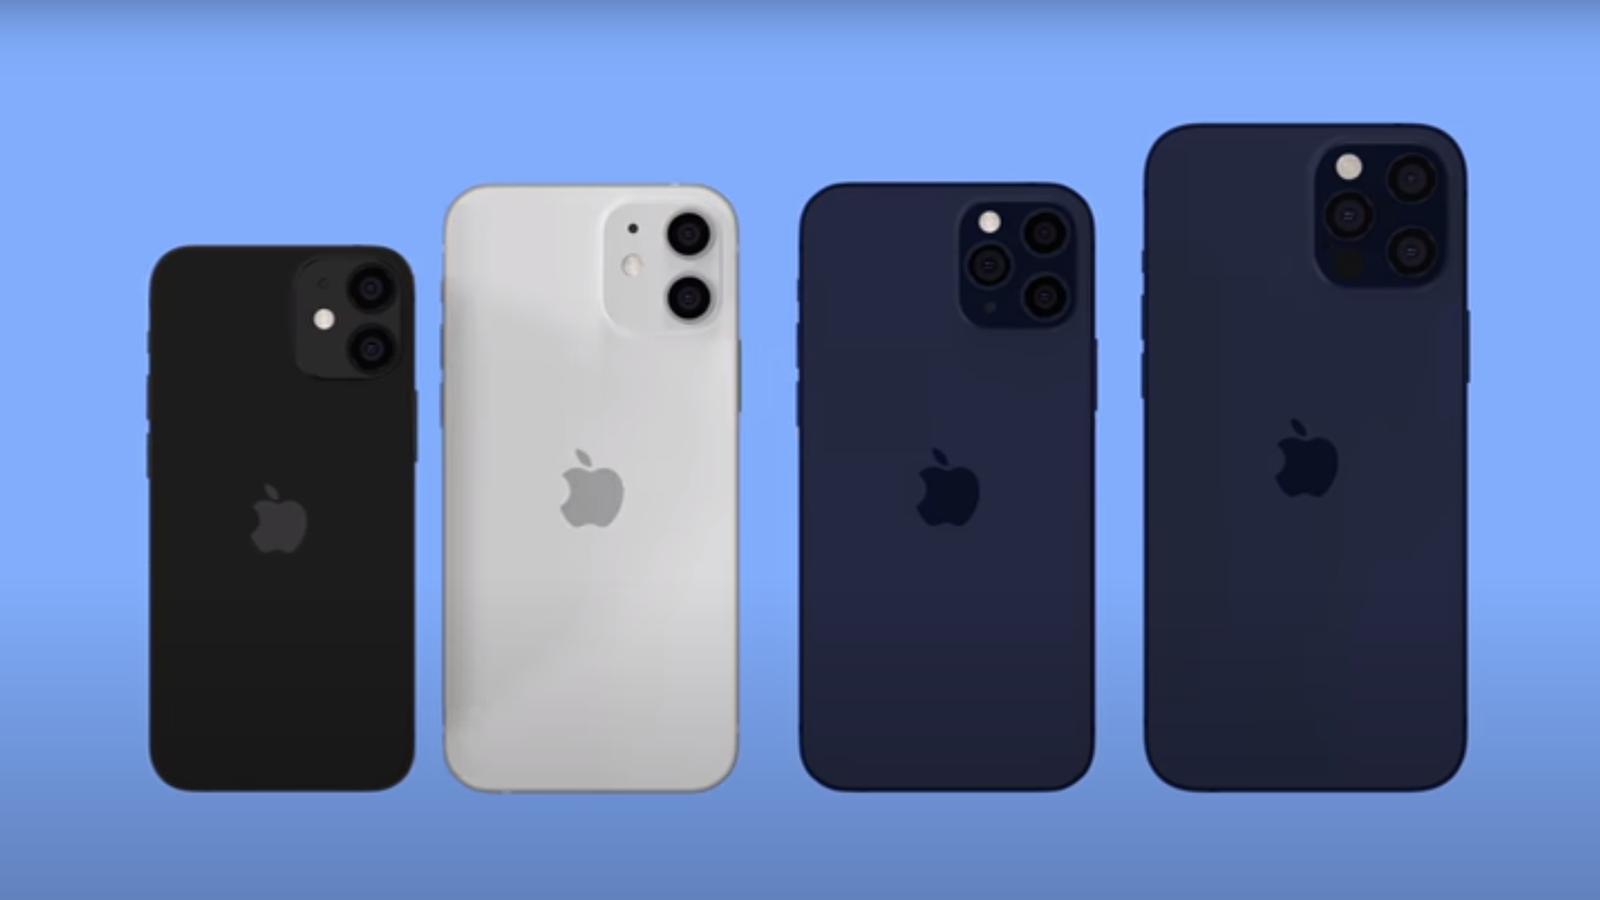 Où voir l'iPhone 12 mini ?